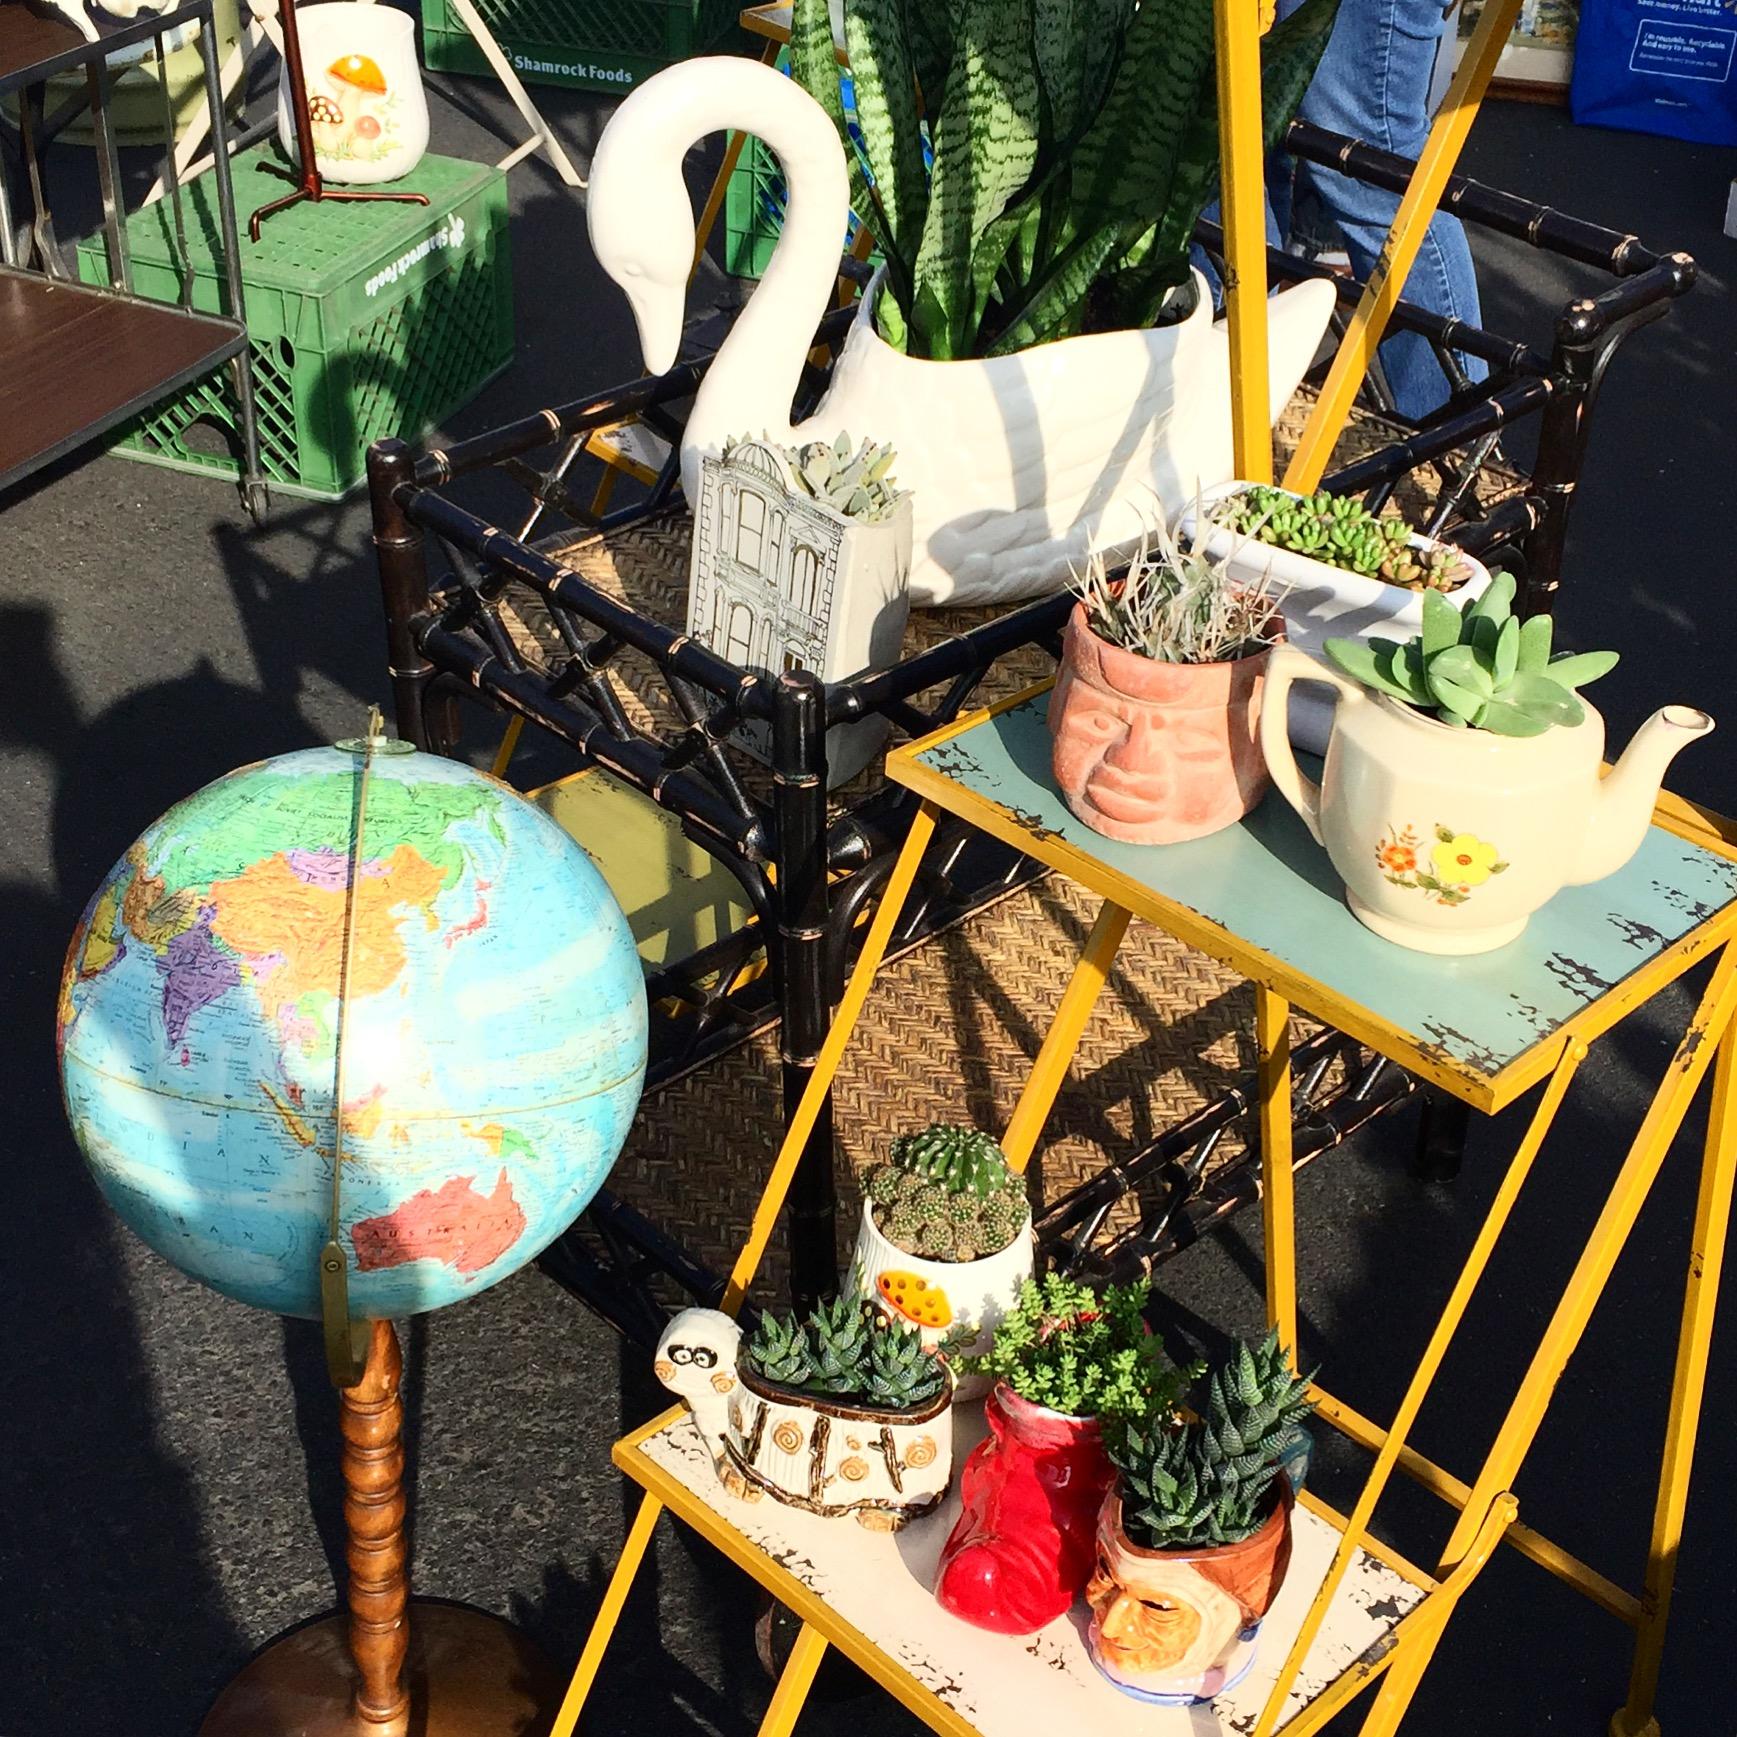 Long Beach Antique Flea Market shopping